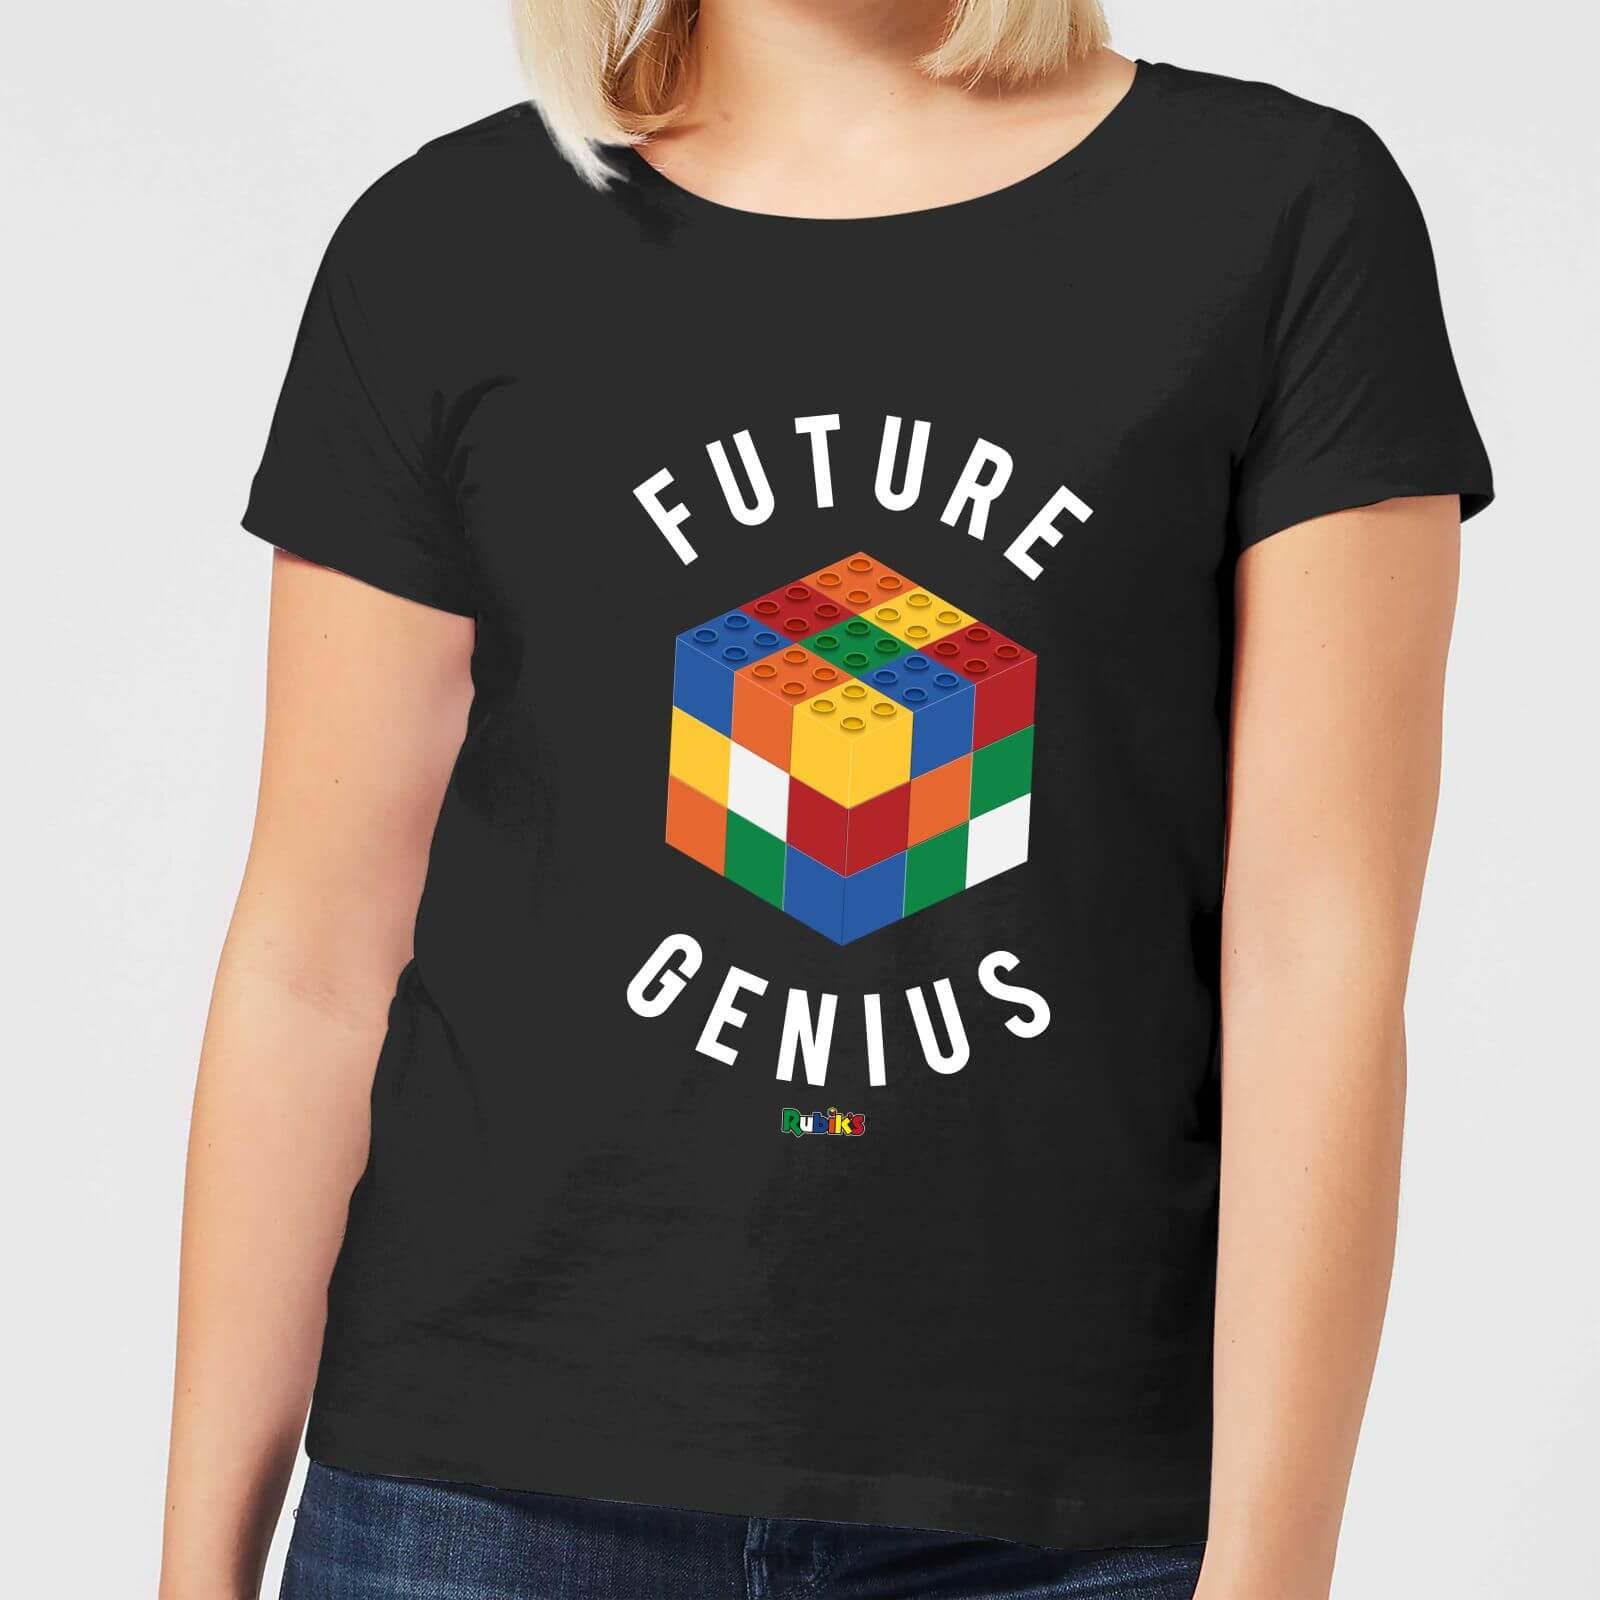 Future Genius Women's T-Shirt - Black - S - Schwarz